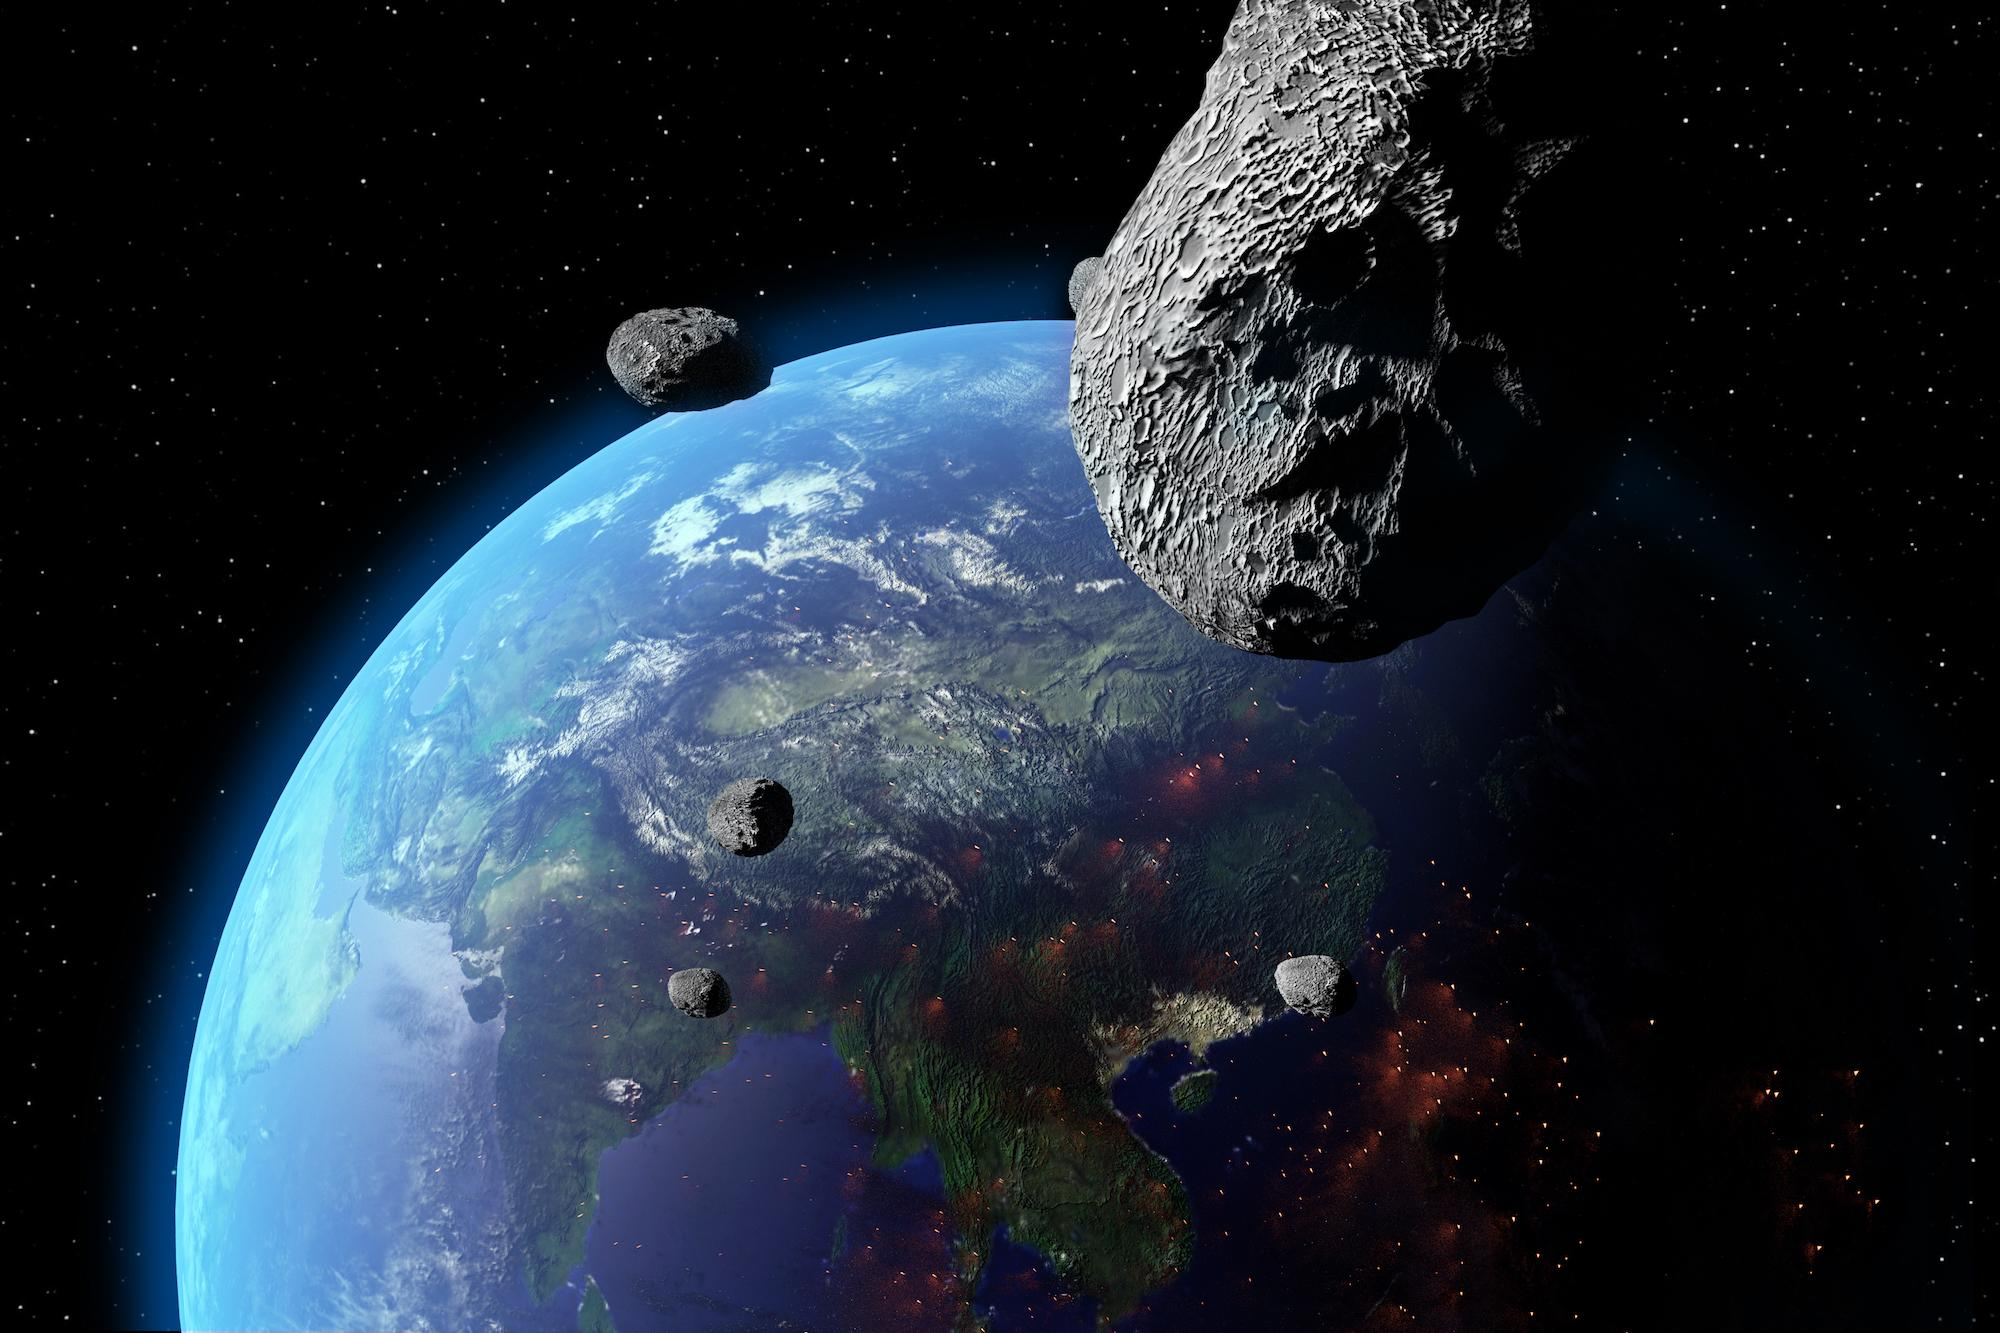 asteroid near earth 2019 - HD2000×1333